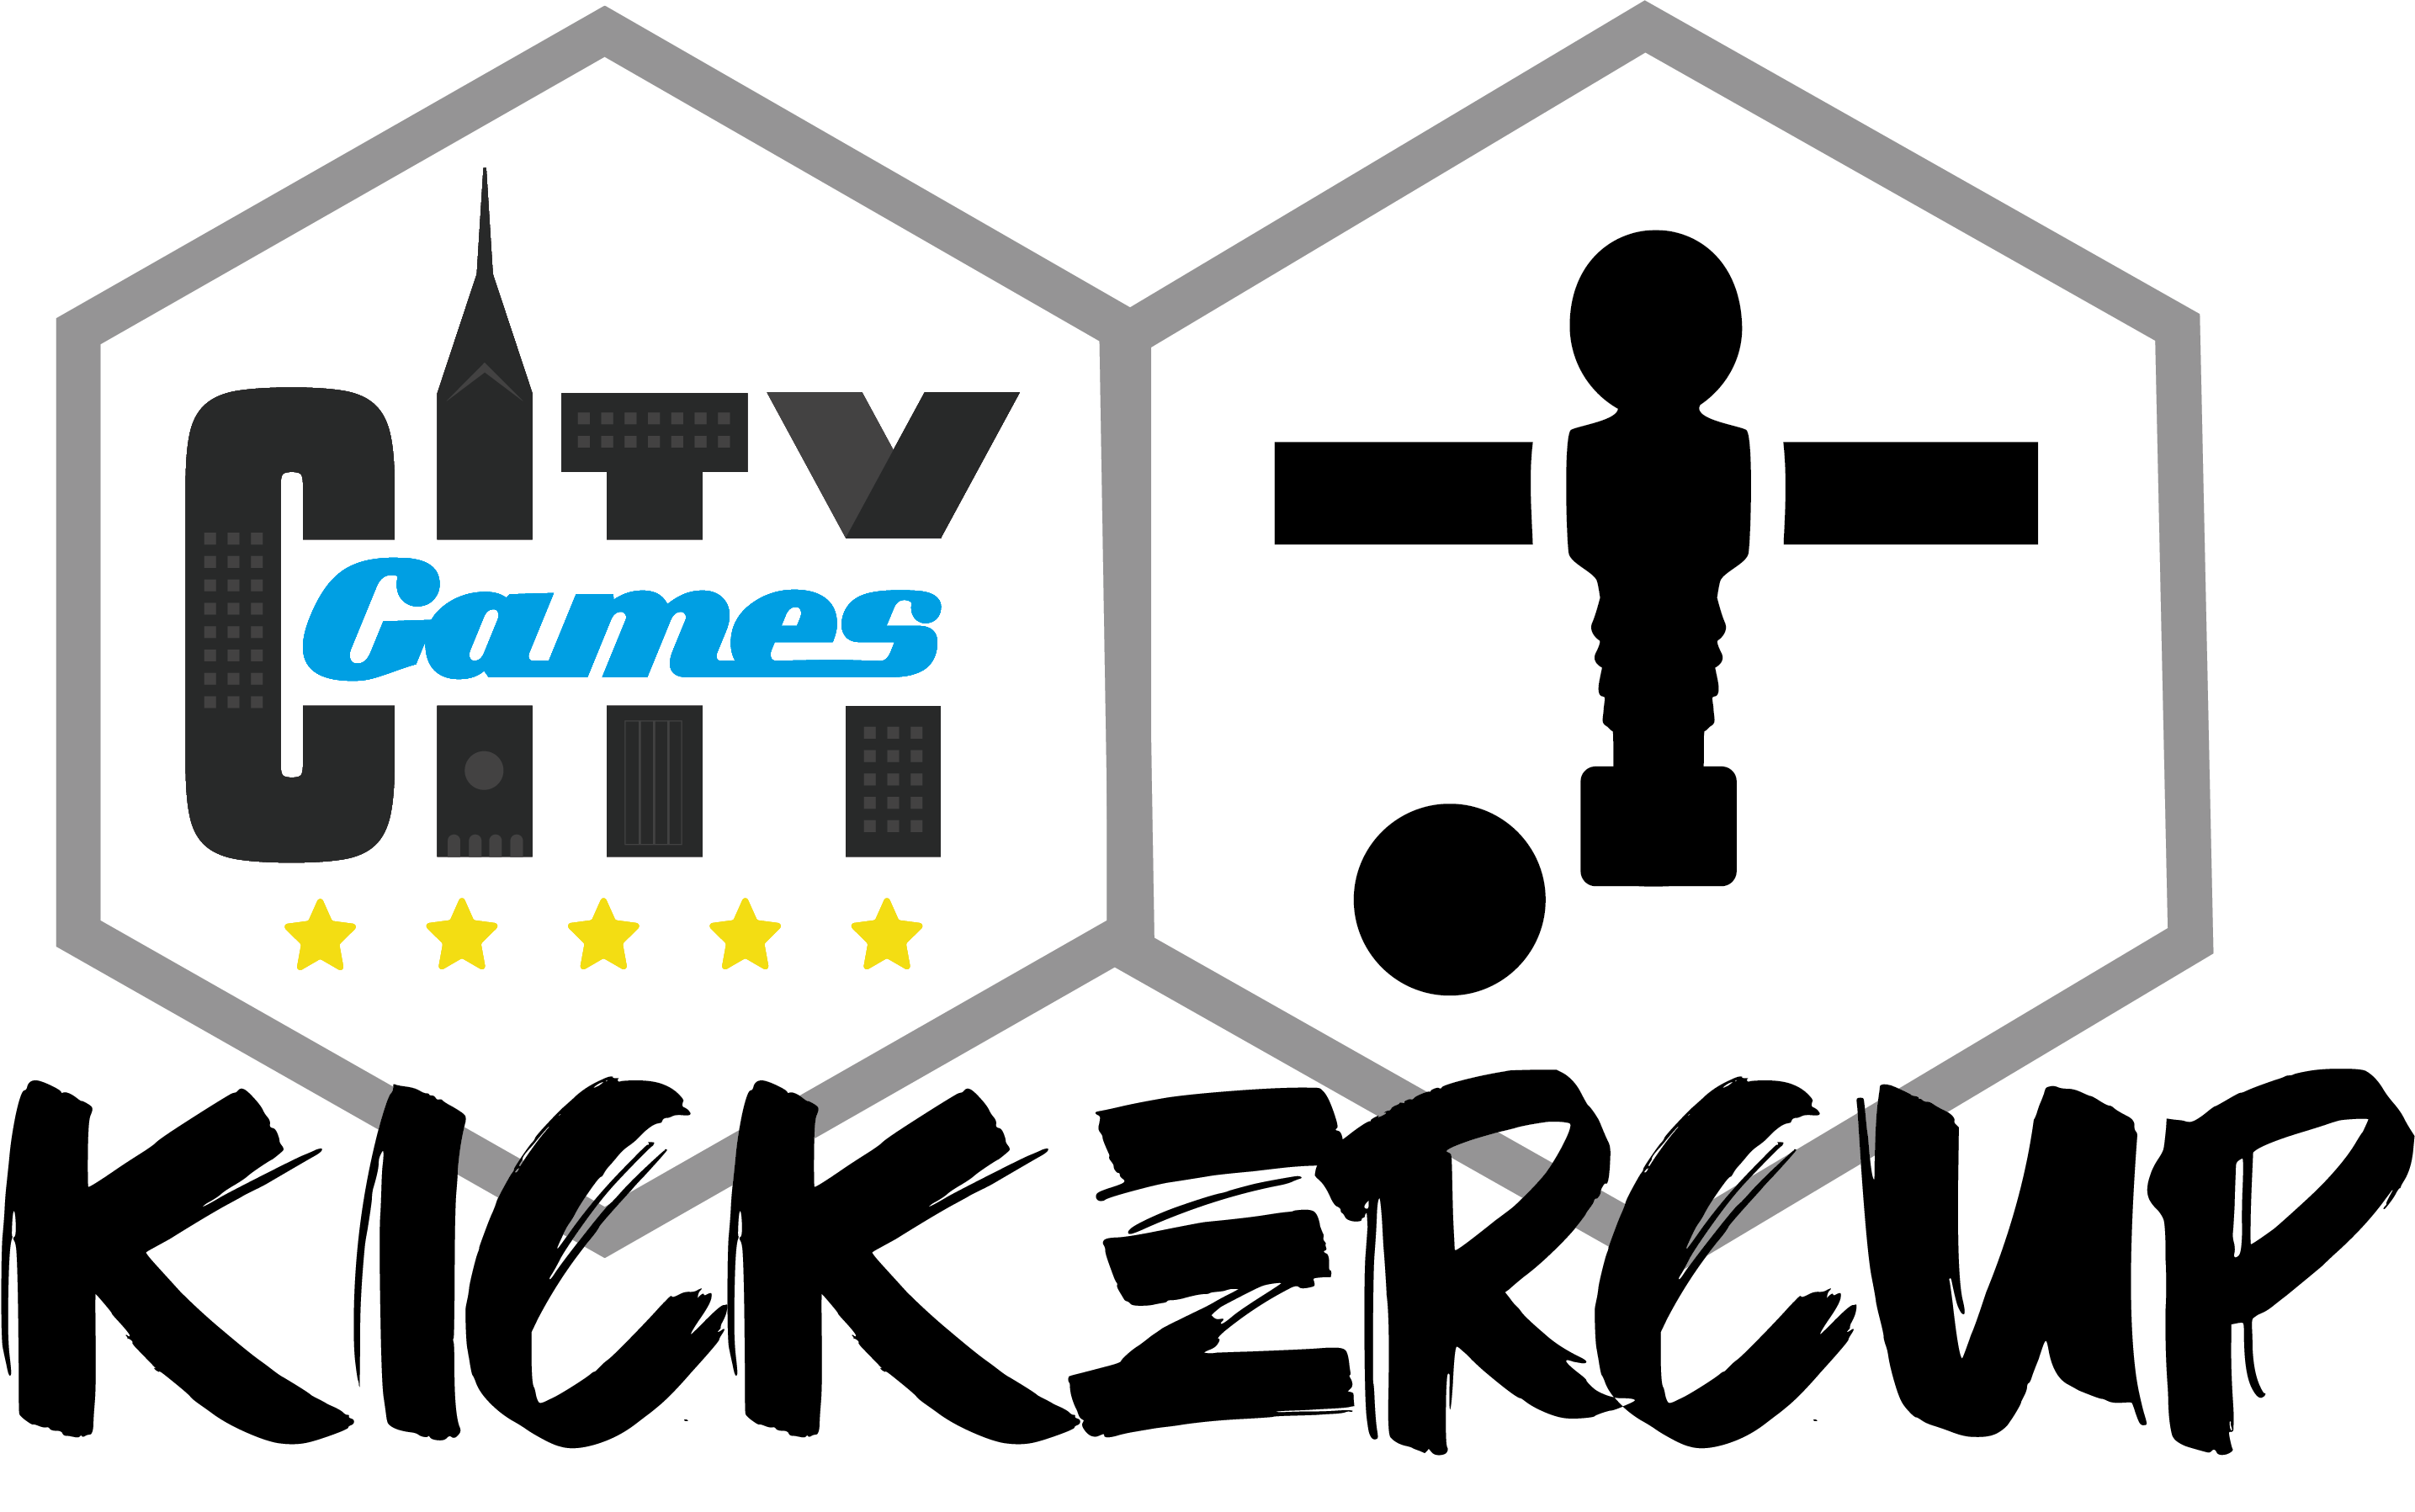 CityGames Kickercup Münster